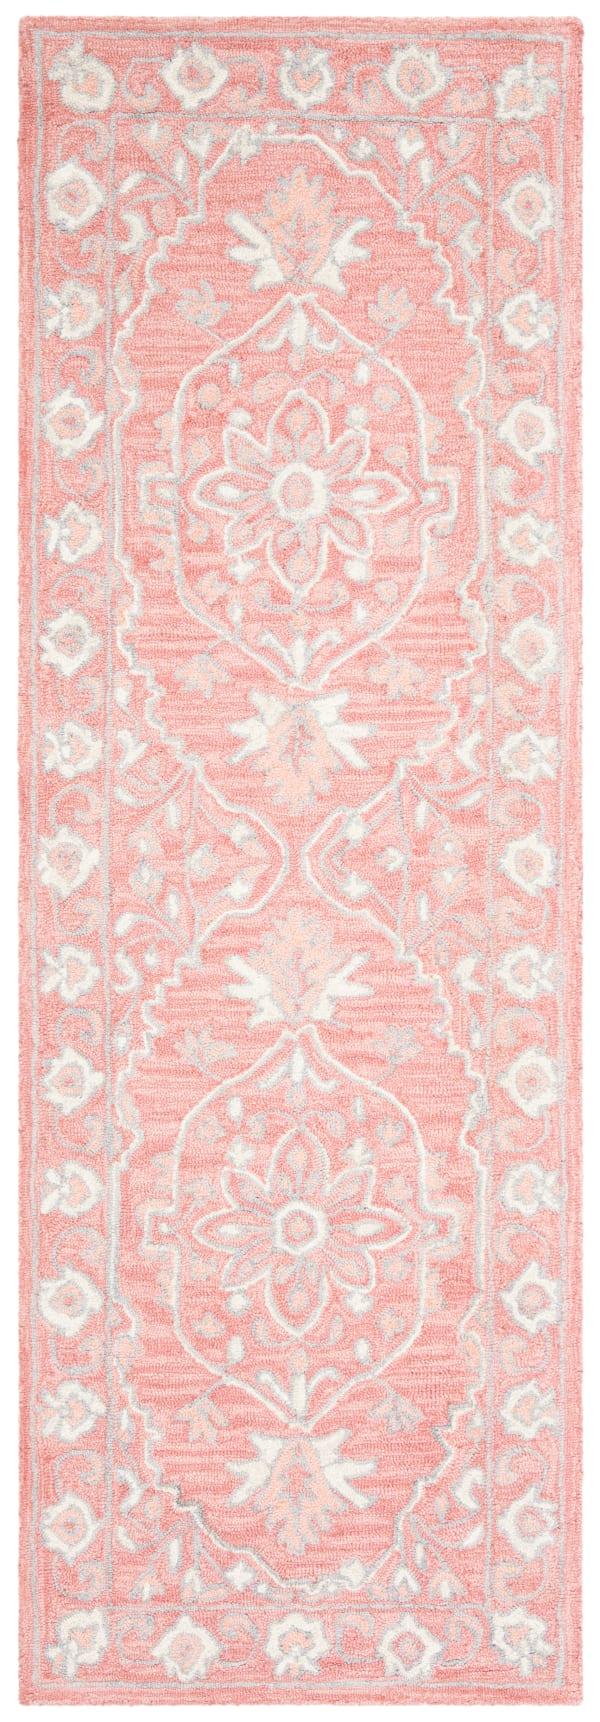 "Safavieh Essence Pink Wool Rug 2'25"" x 7'"